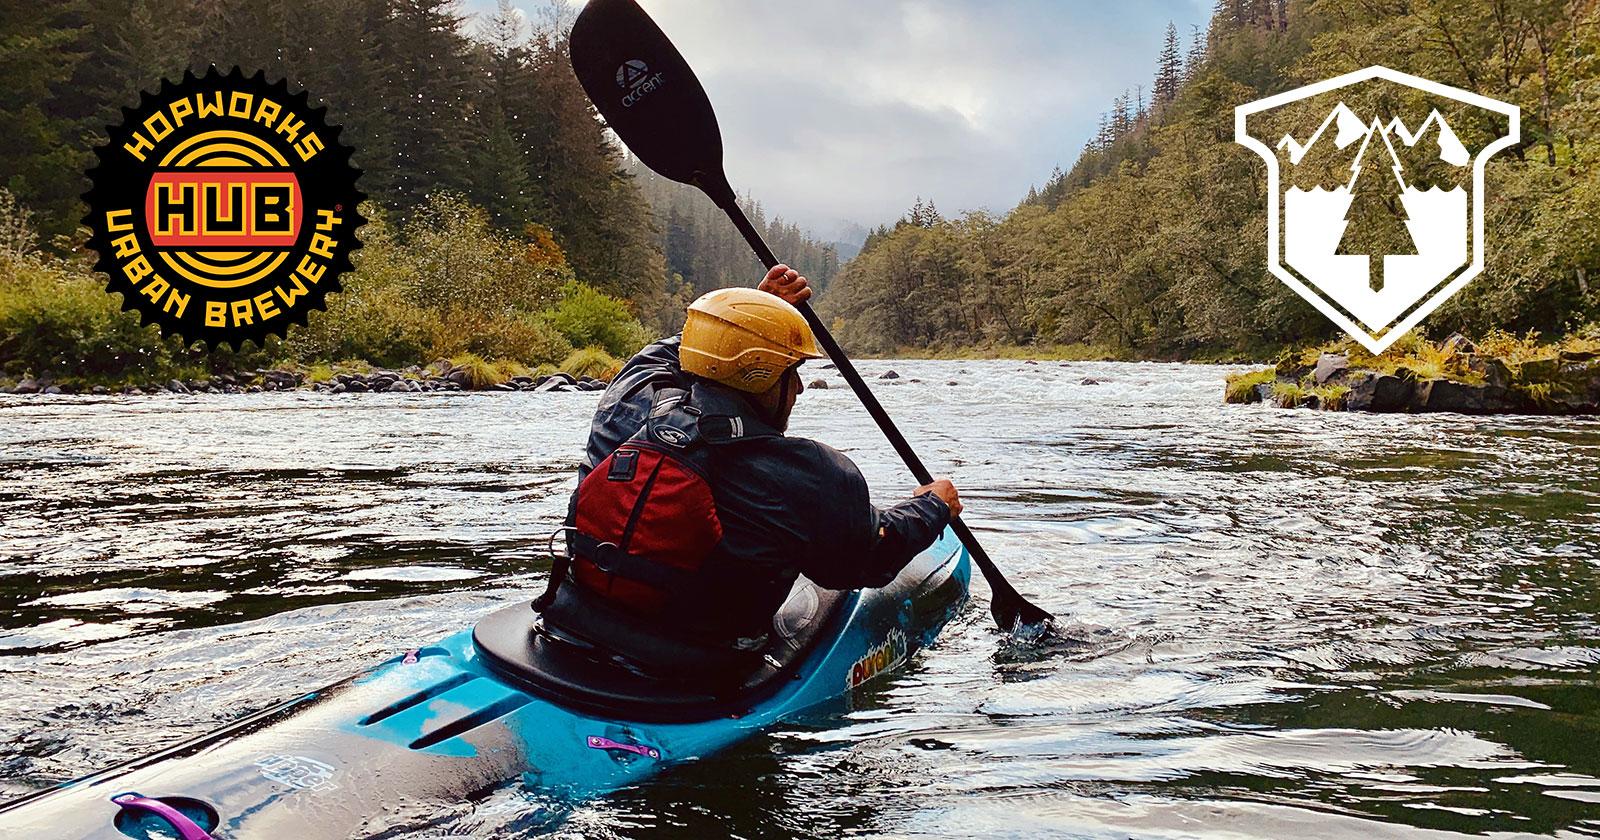 Thirsty Thursday: Intro to Whitewater Kayaking